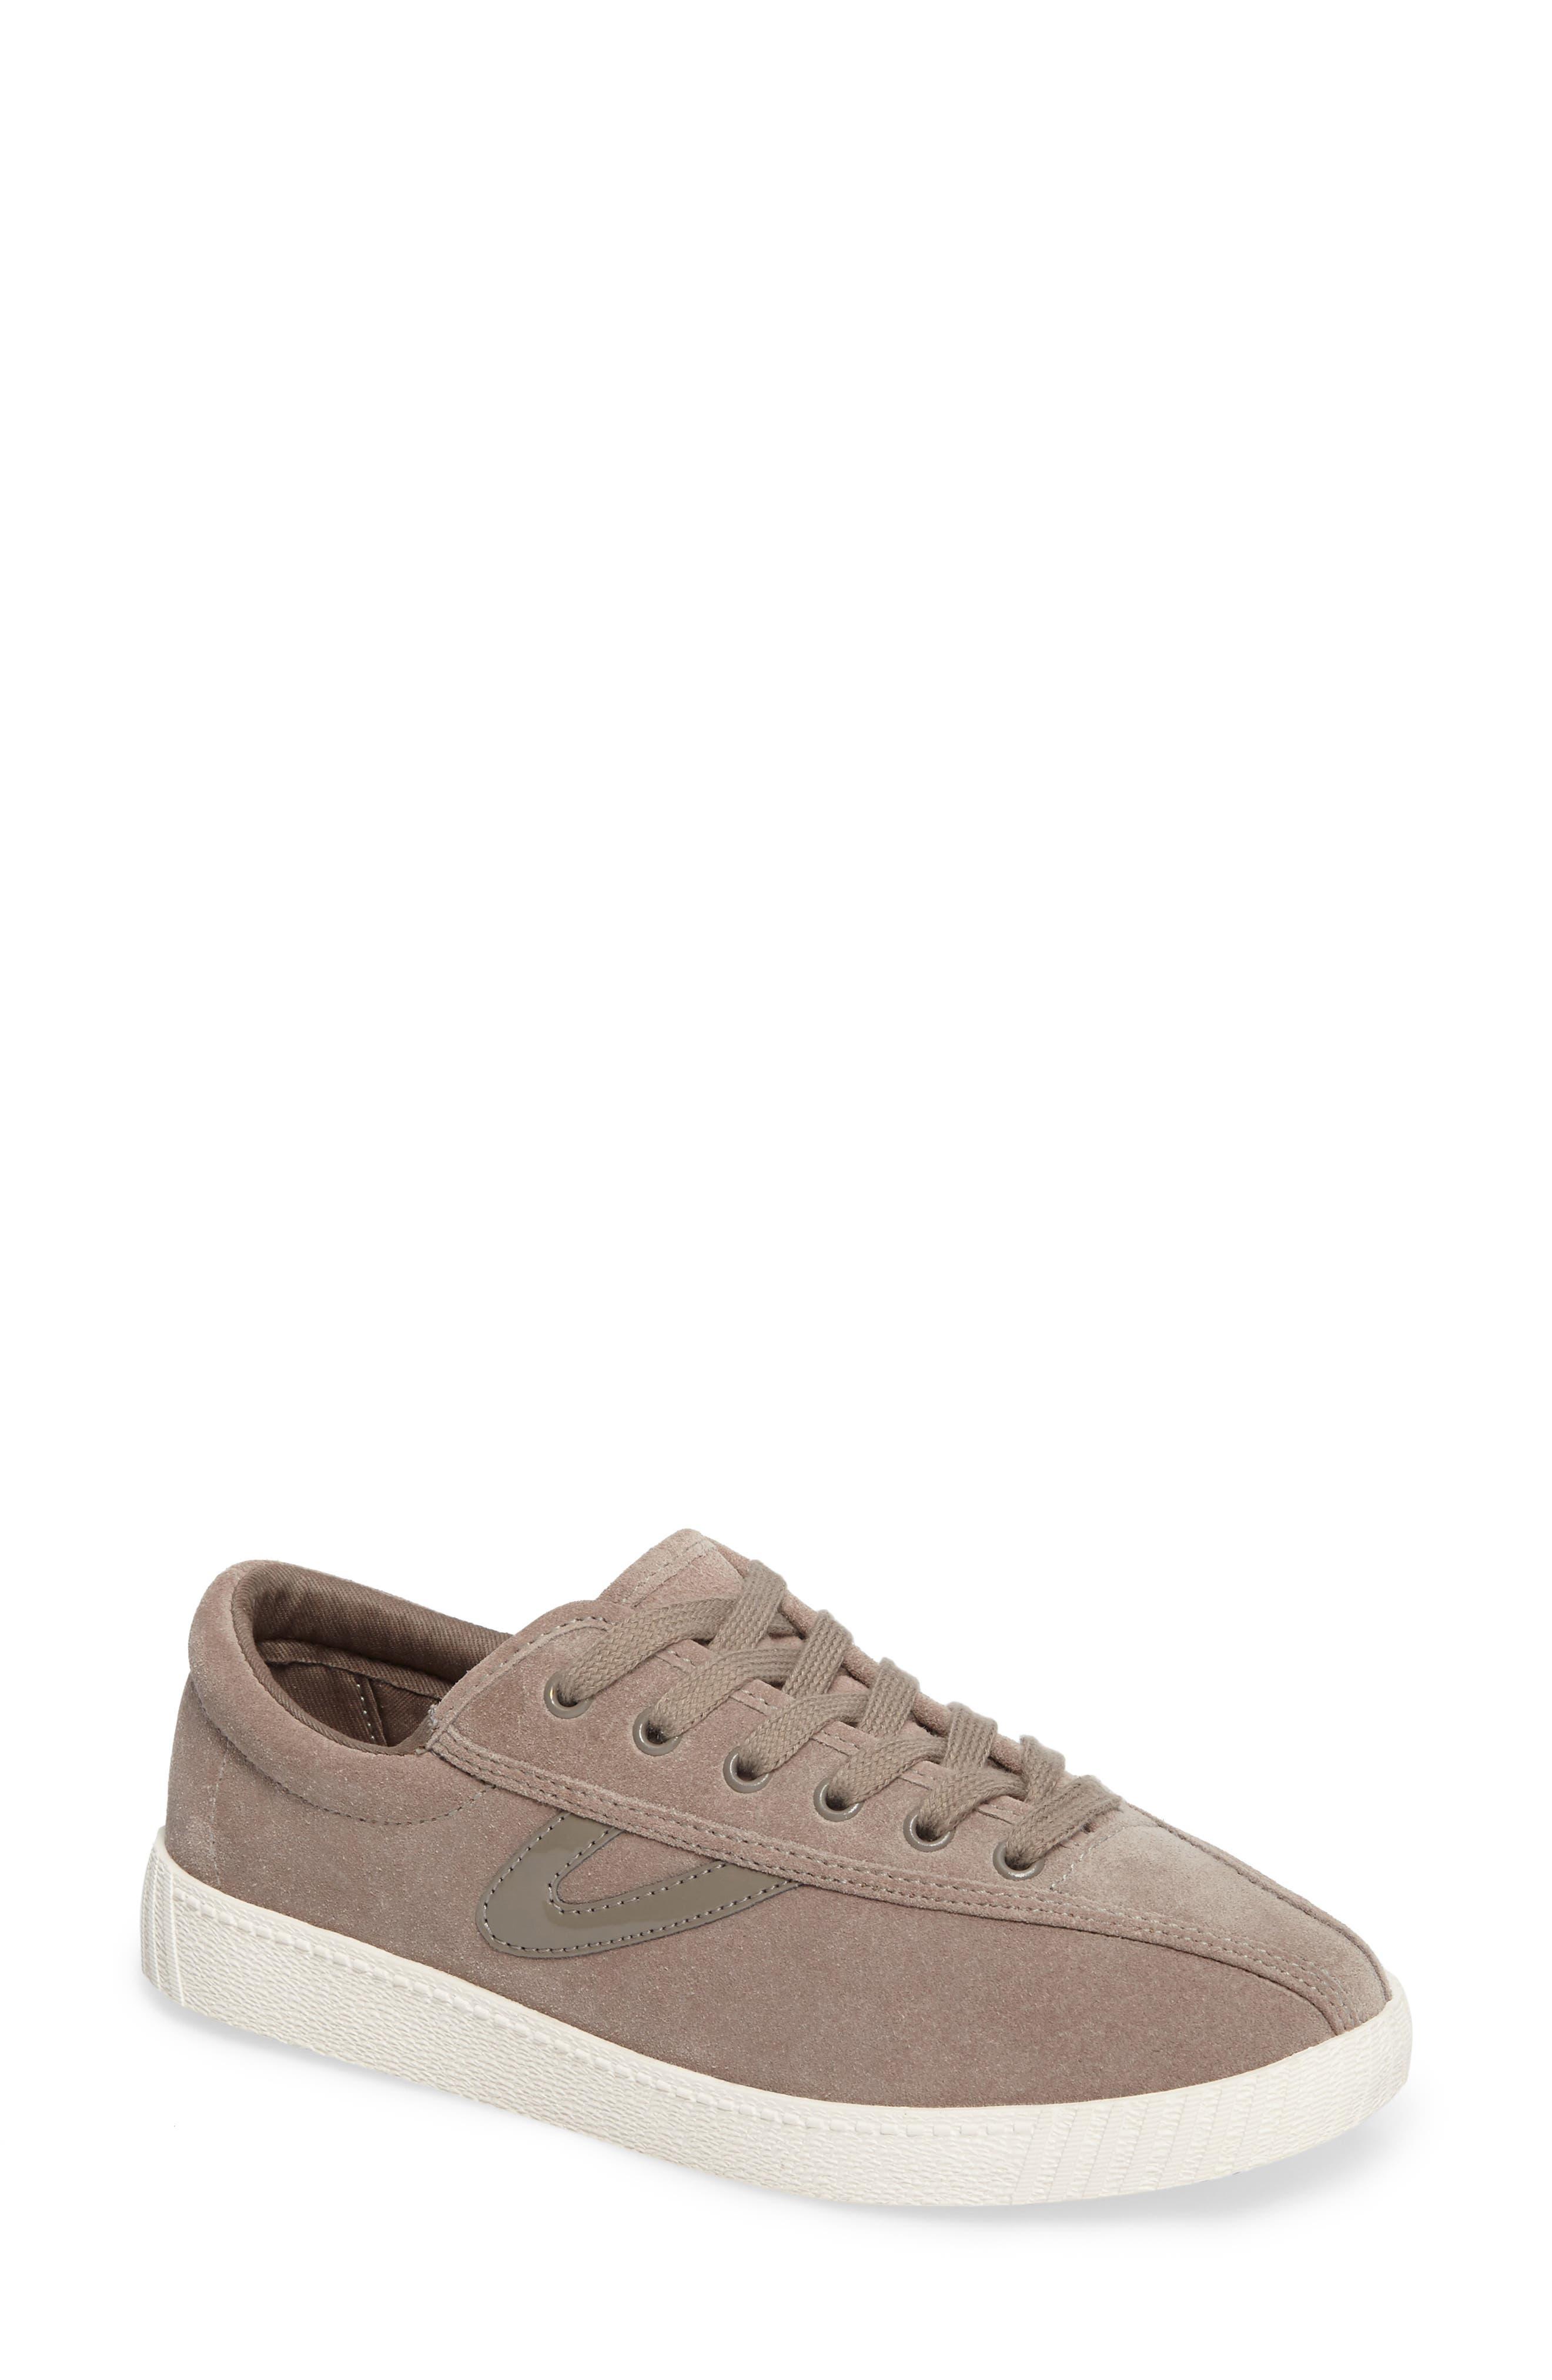 Tretorn 'Nylite2 Plus' Sneaker (Women)